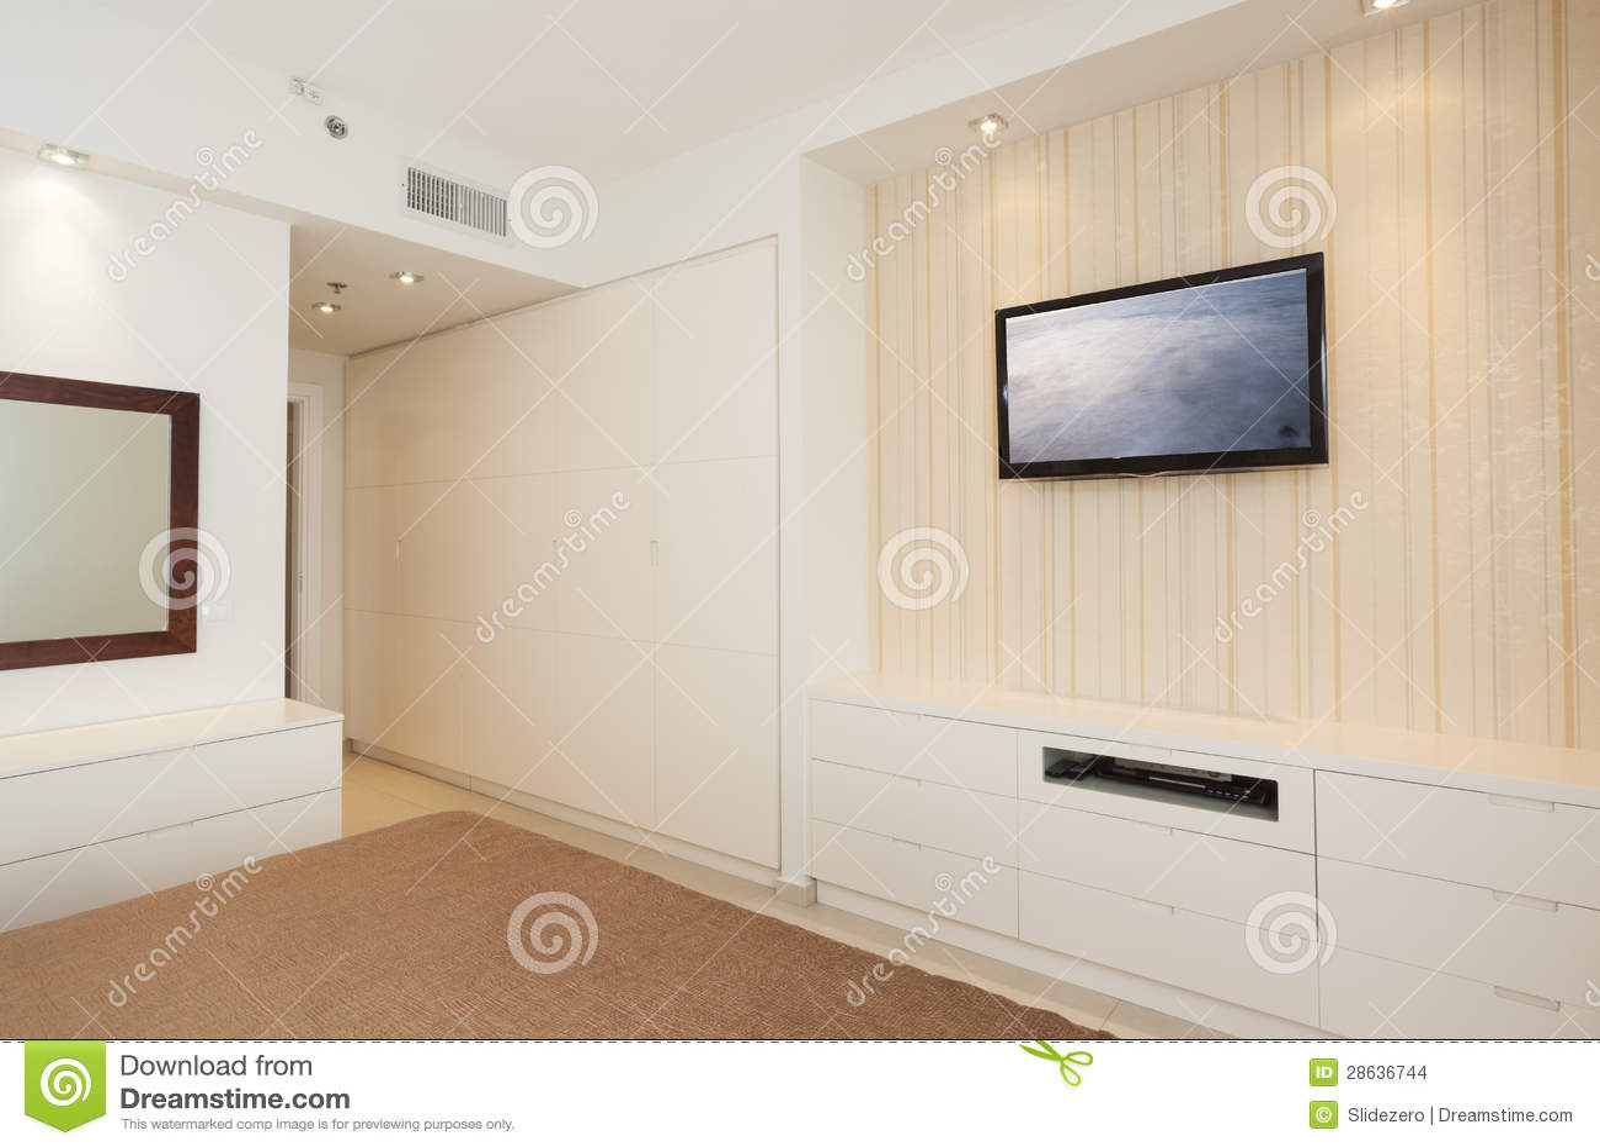 Chambre Coucher Lumineuse De Luxe Avec Hd Tv Images Stock Image 28636744